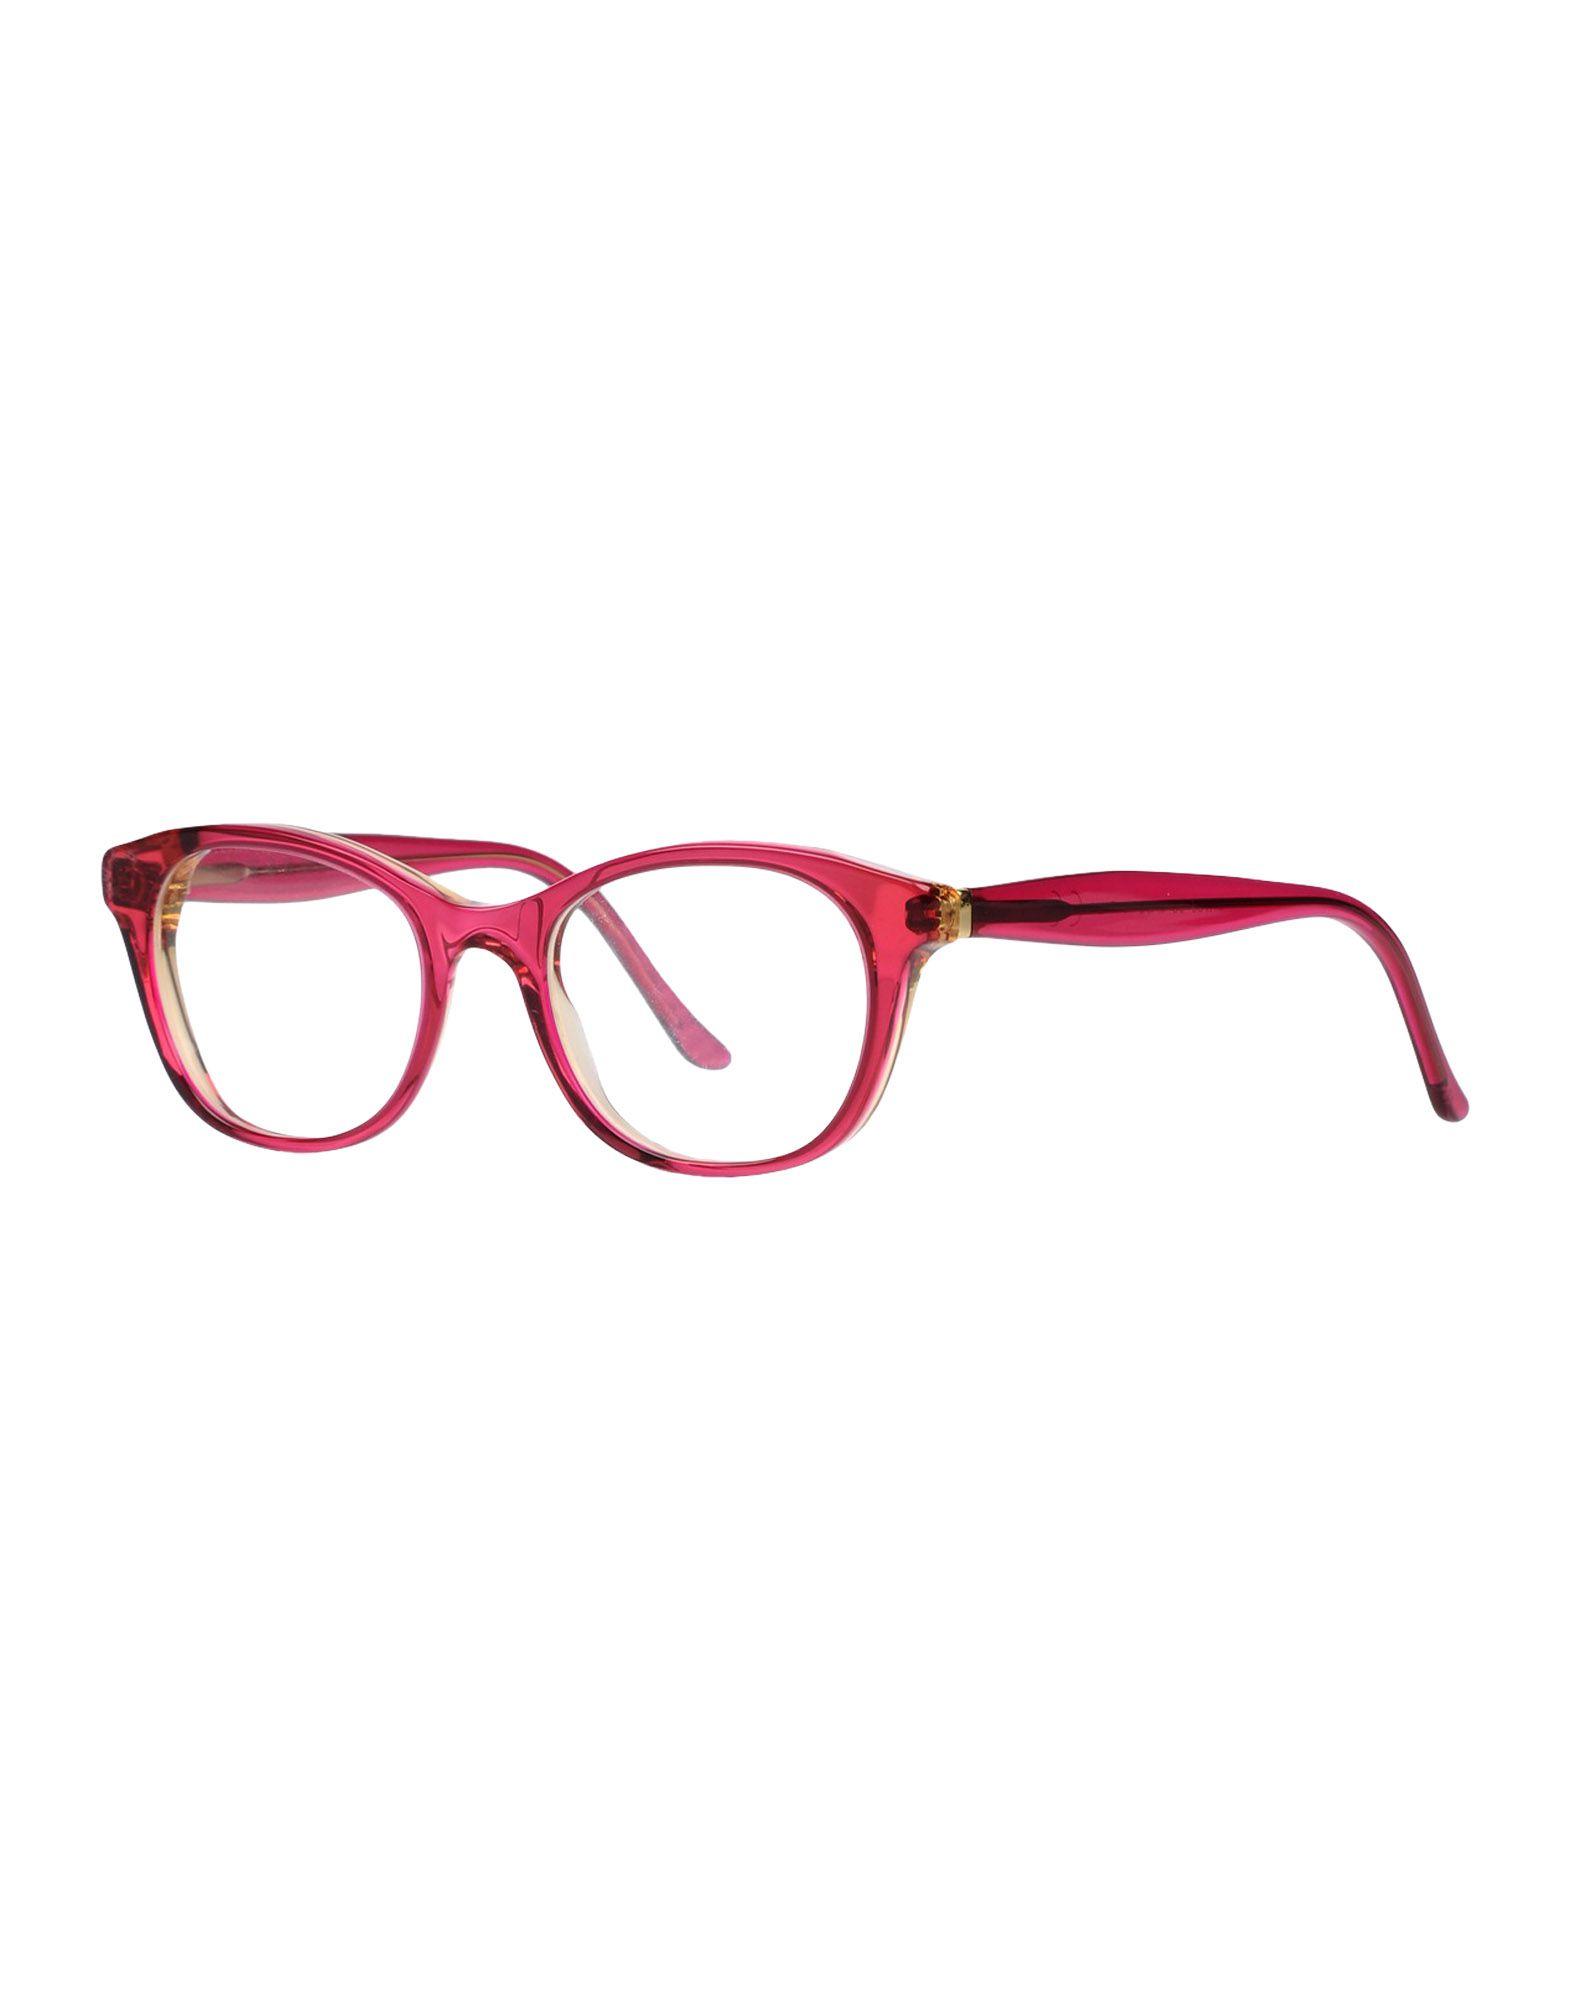 MARNI Damen Brille Farbe Purpur Größe 1